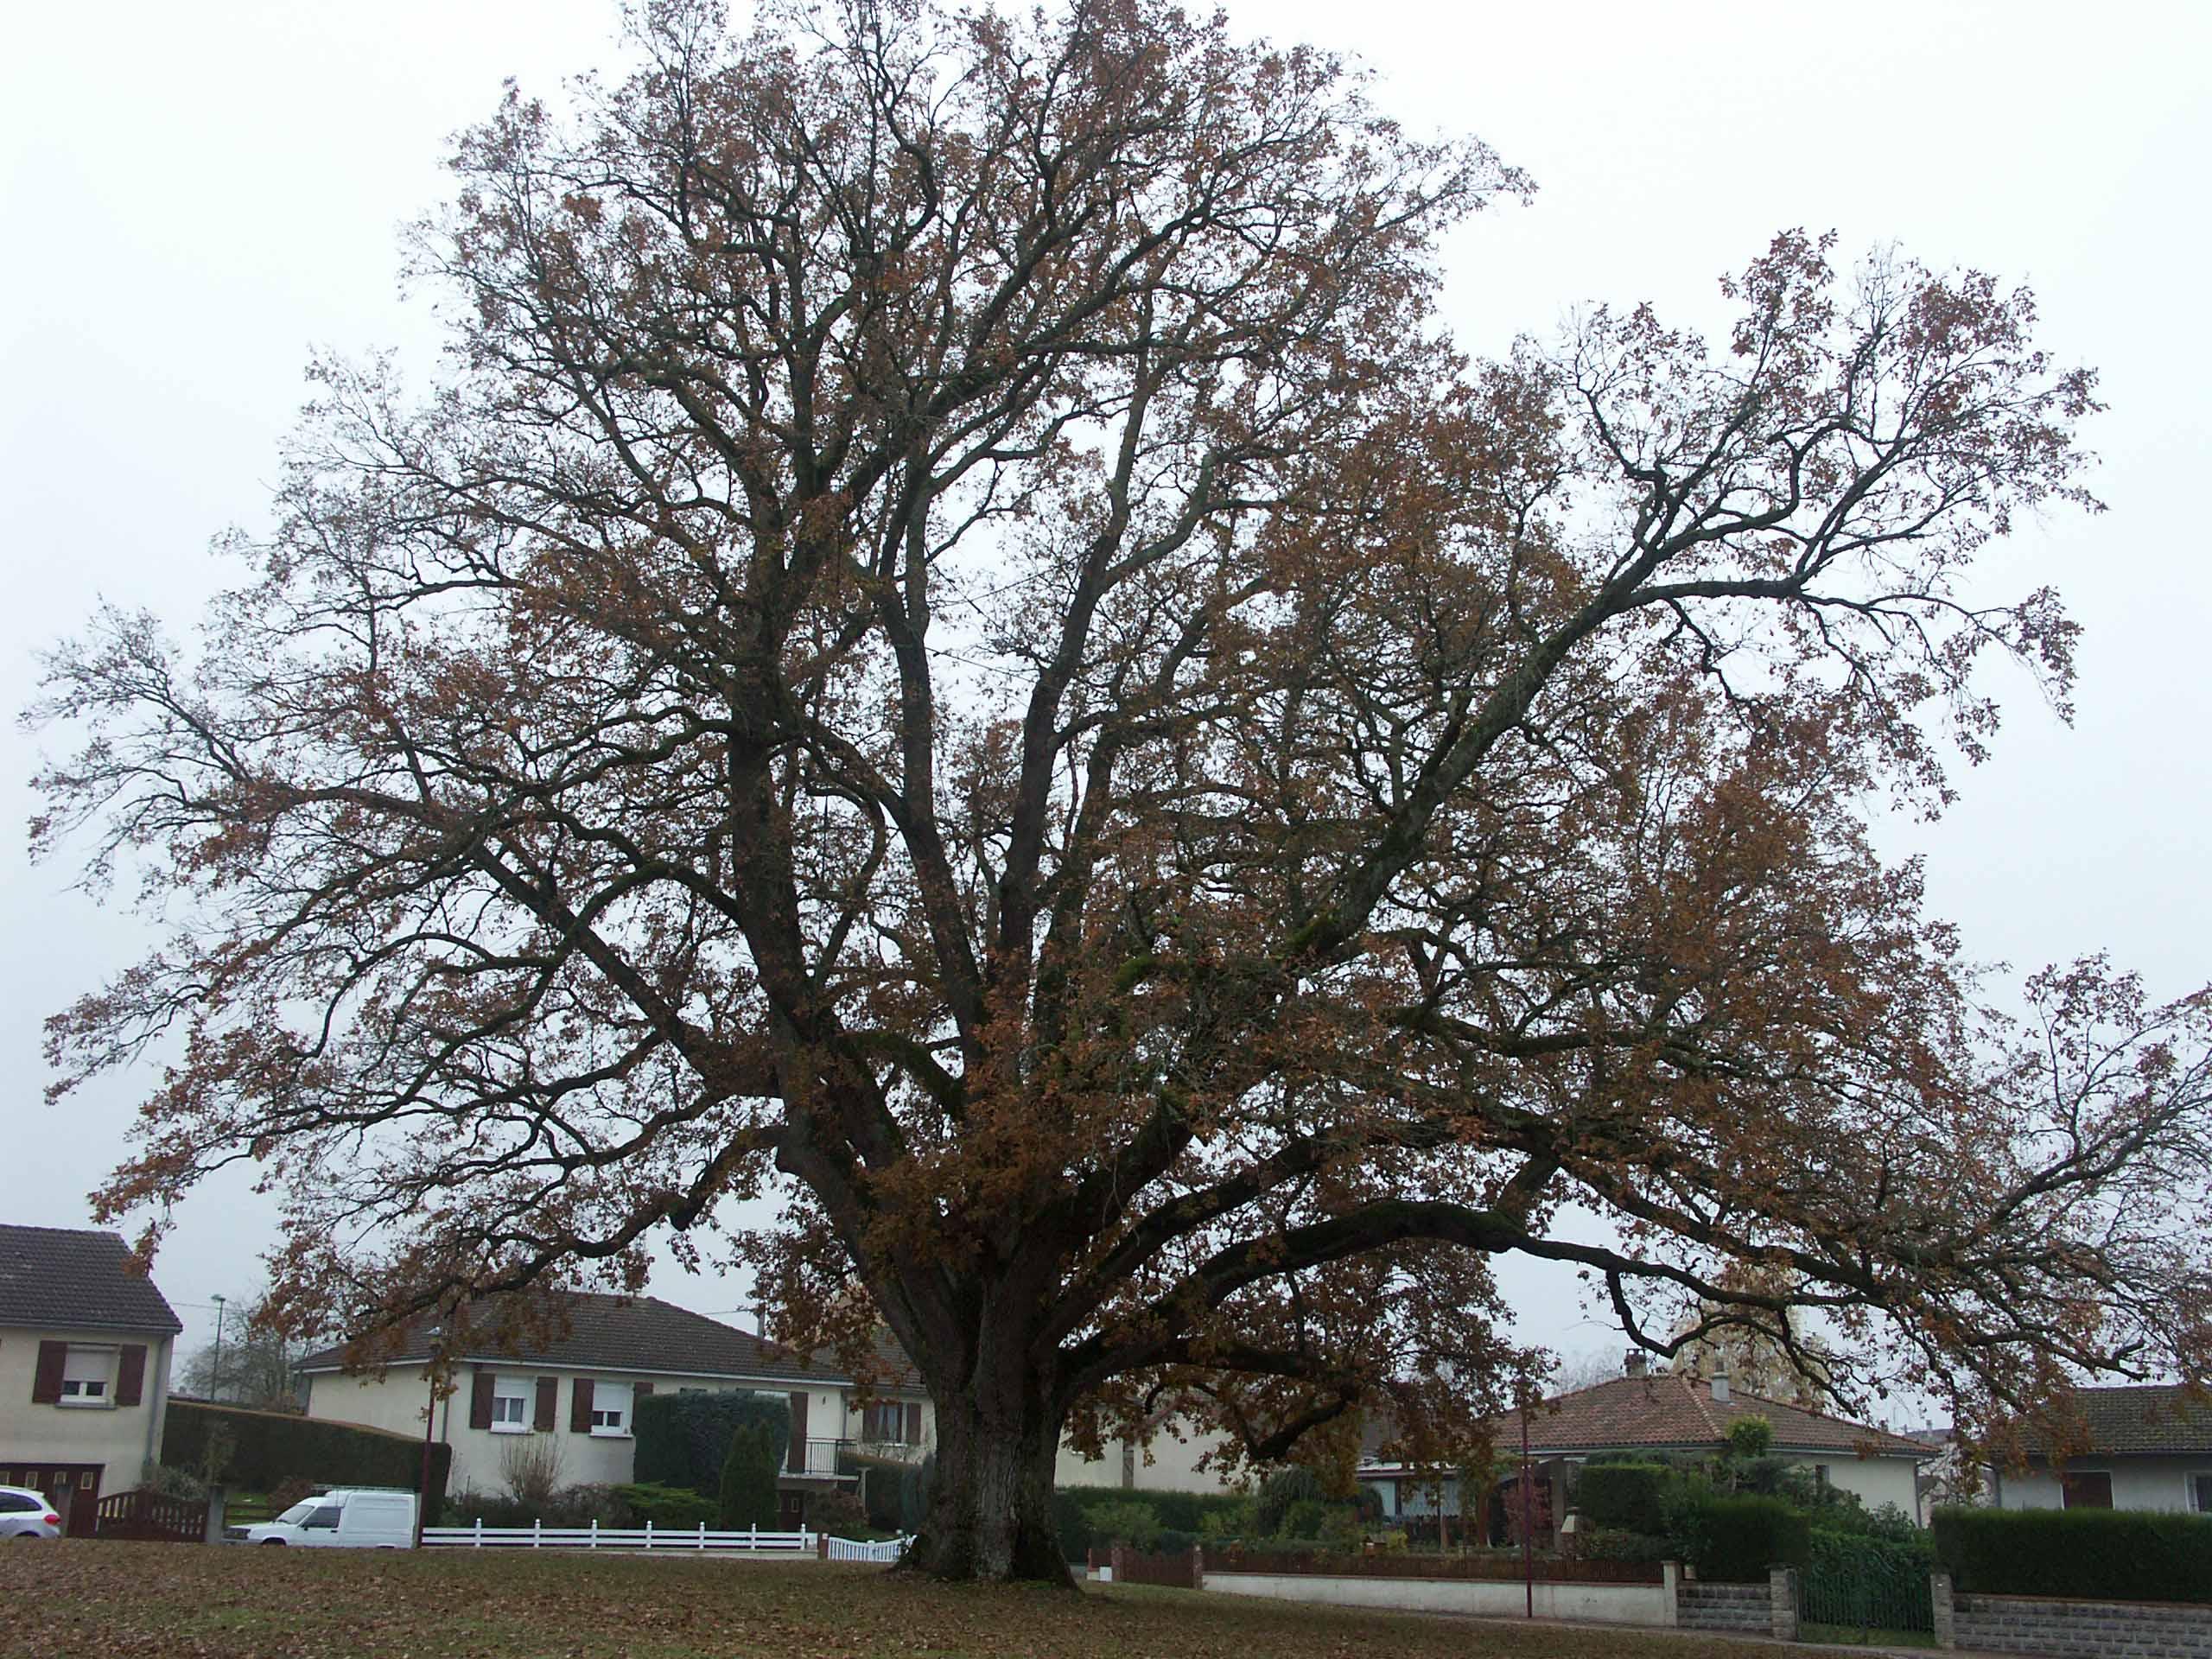 Le grand chêne